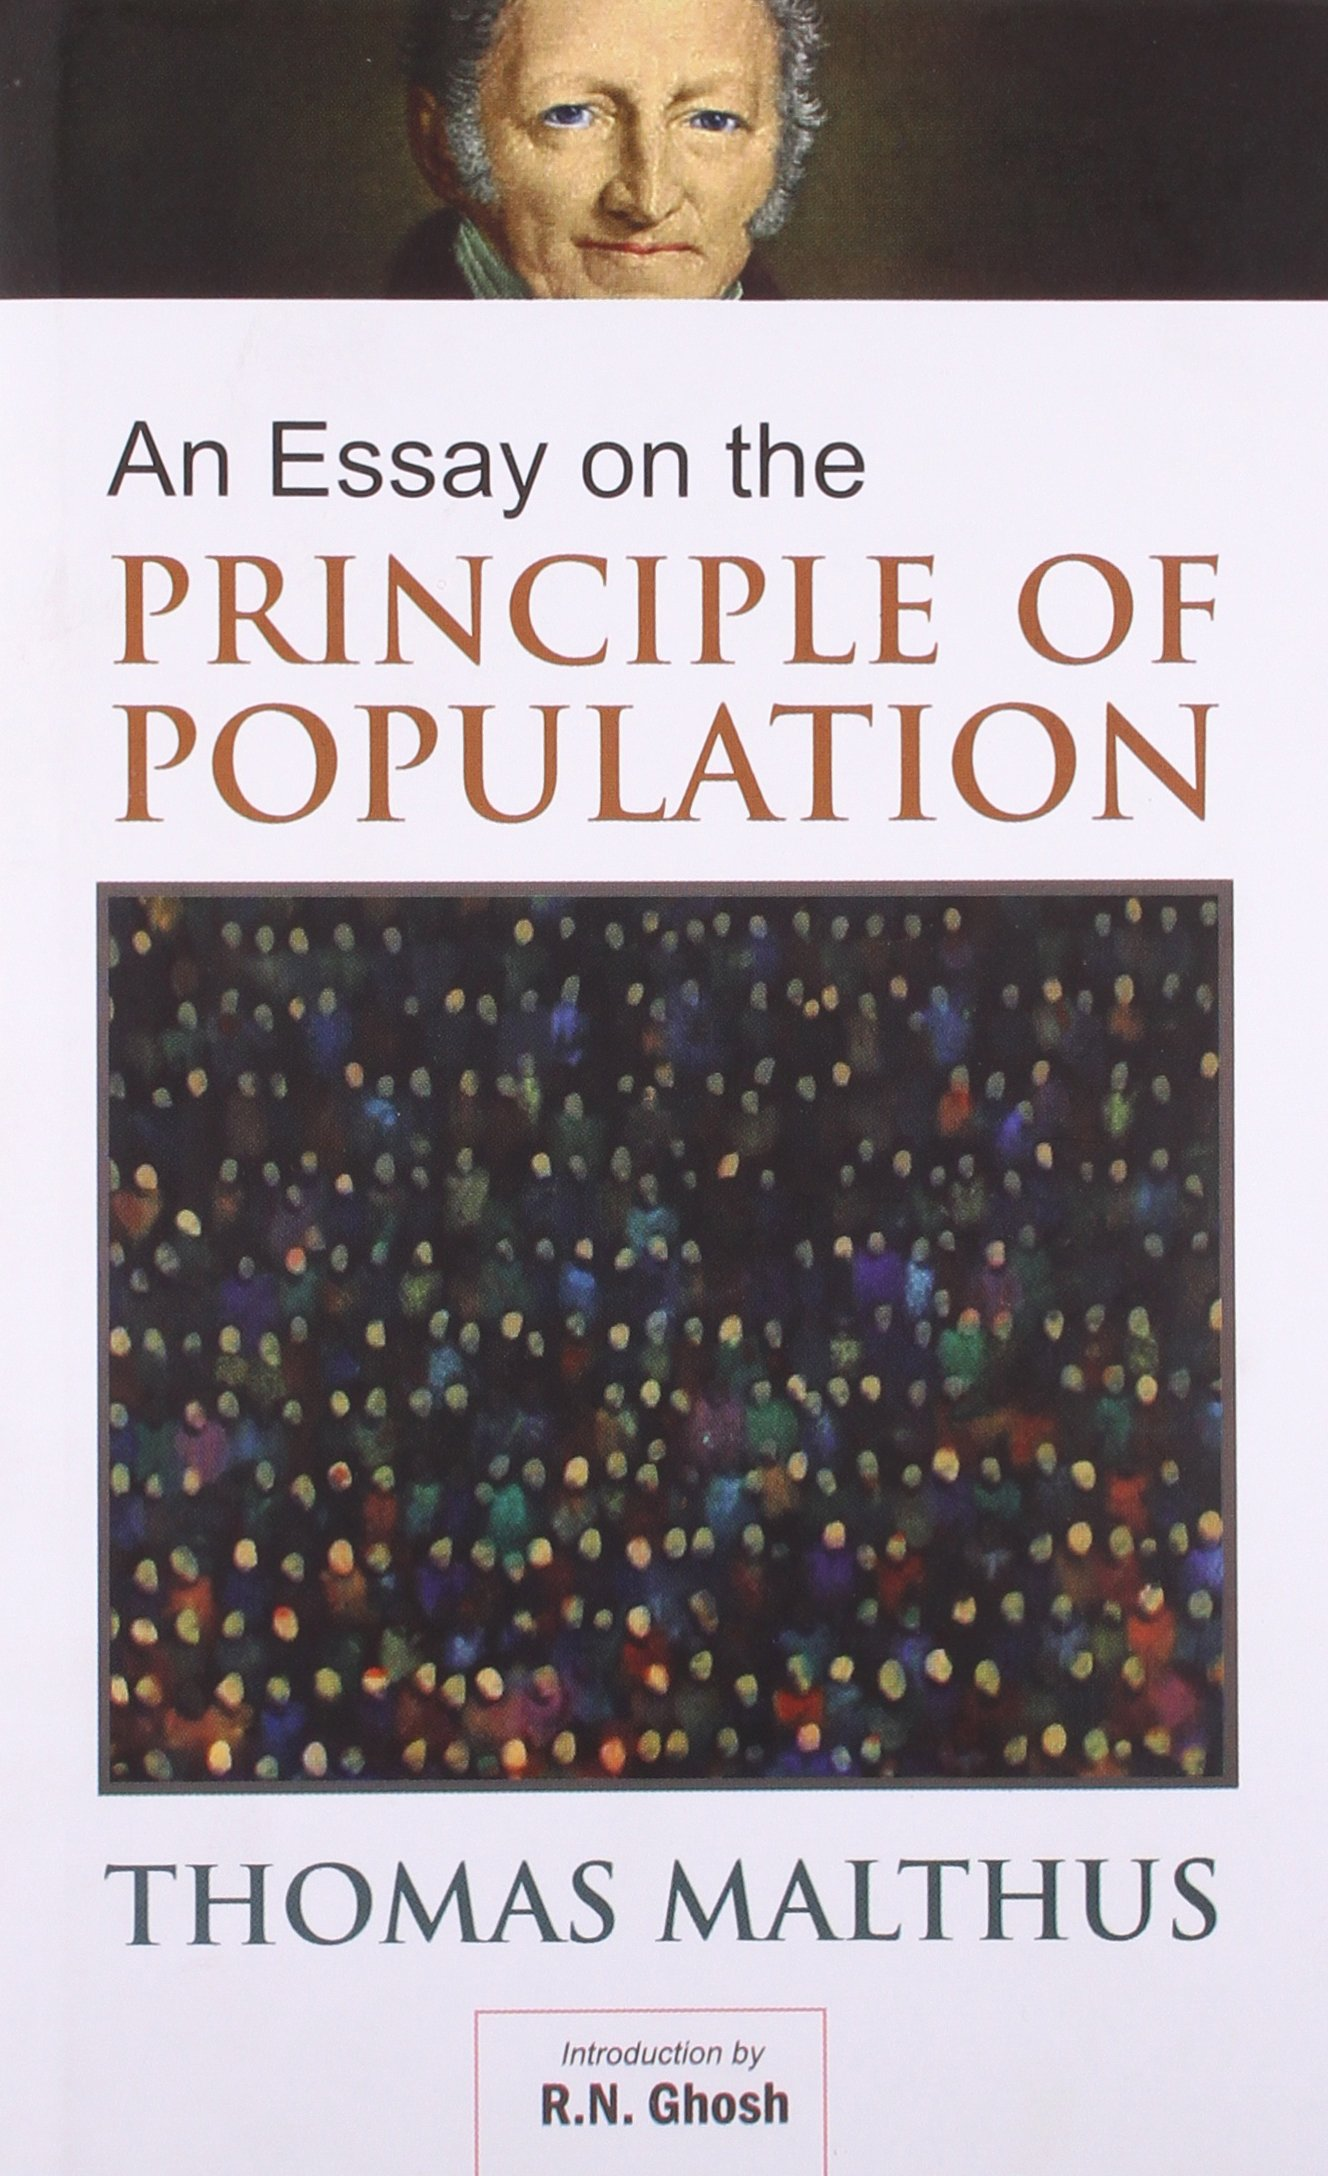 006 Essay On The Principle Of Population 8162bfm1ycfl Singular Pdf By Thomas Malthus Main Idea Full